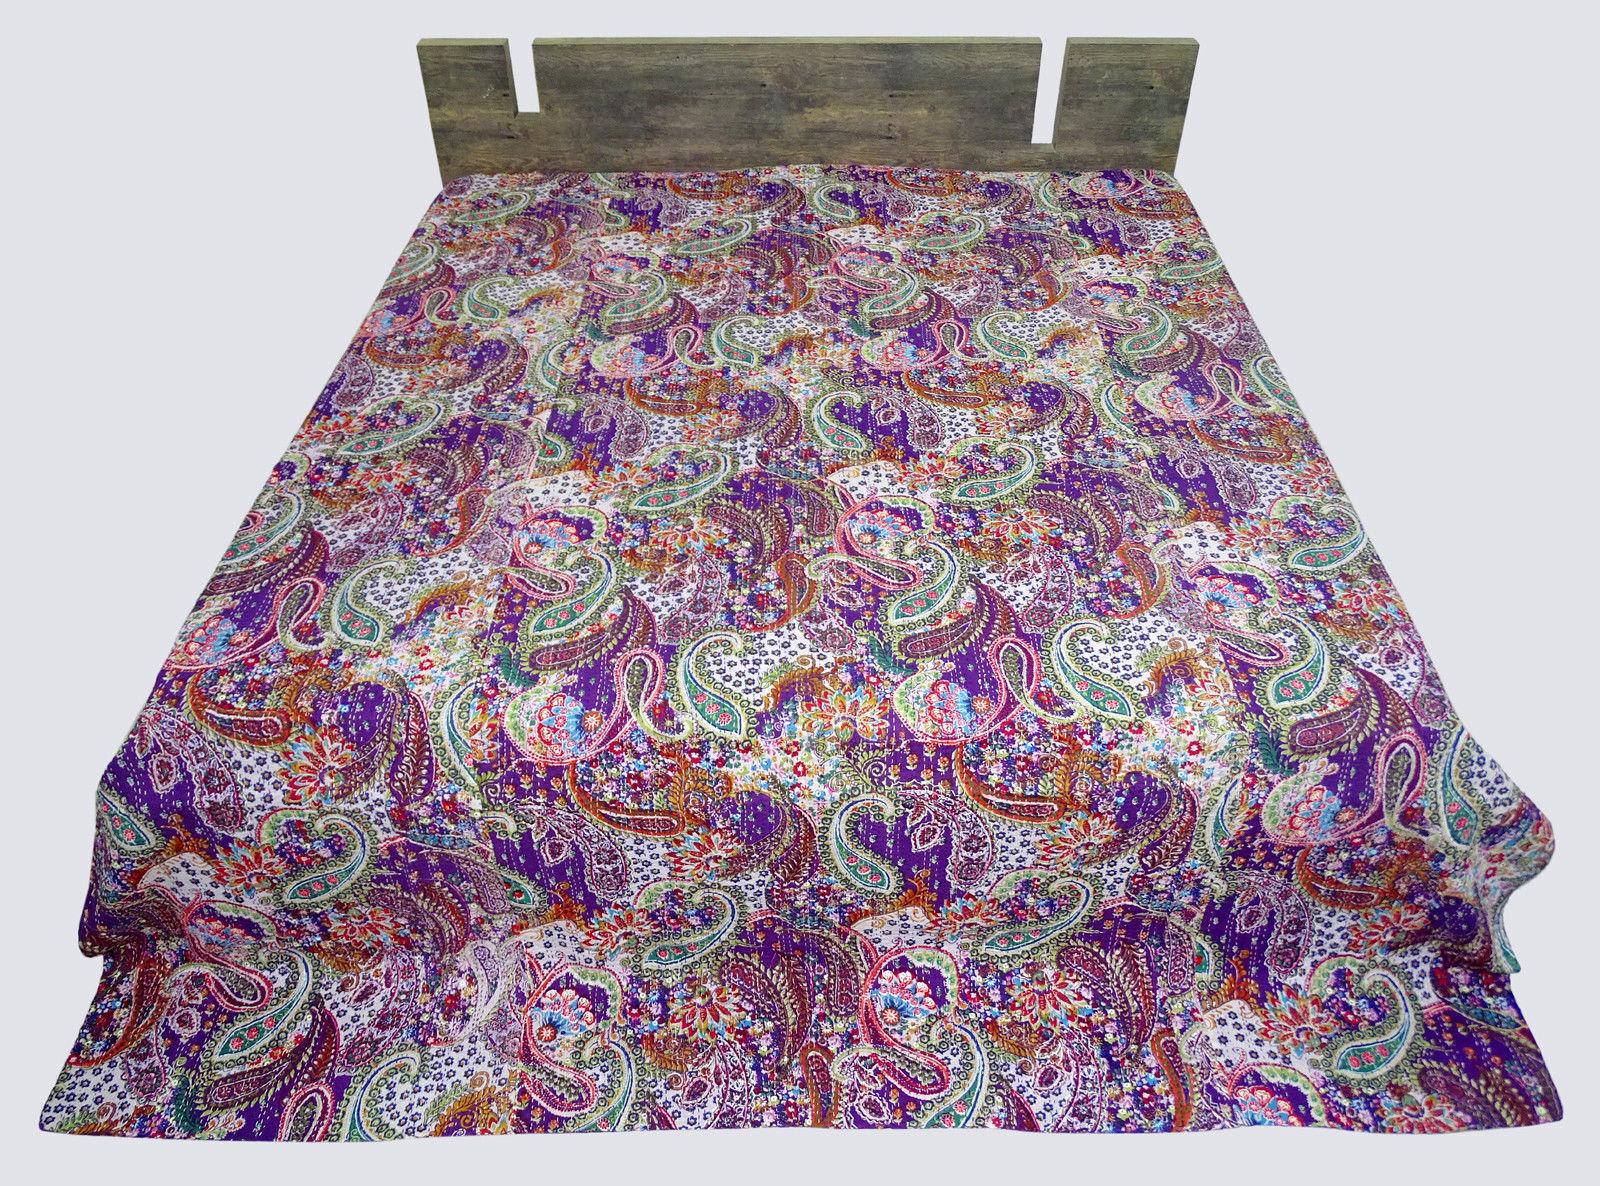 Sanganeri Screen Printed Purple 100% cotton Kantha Twin Size Quilt 6090 measure